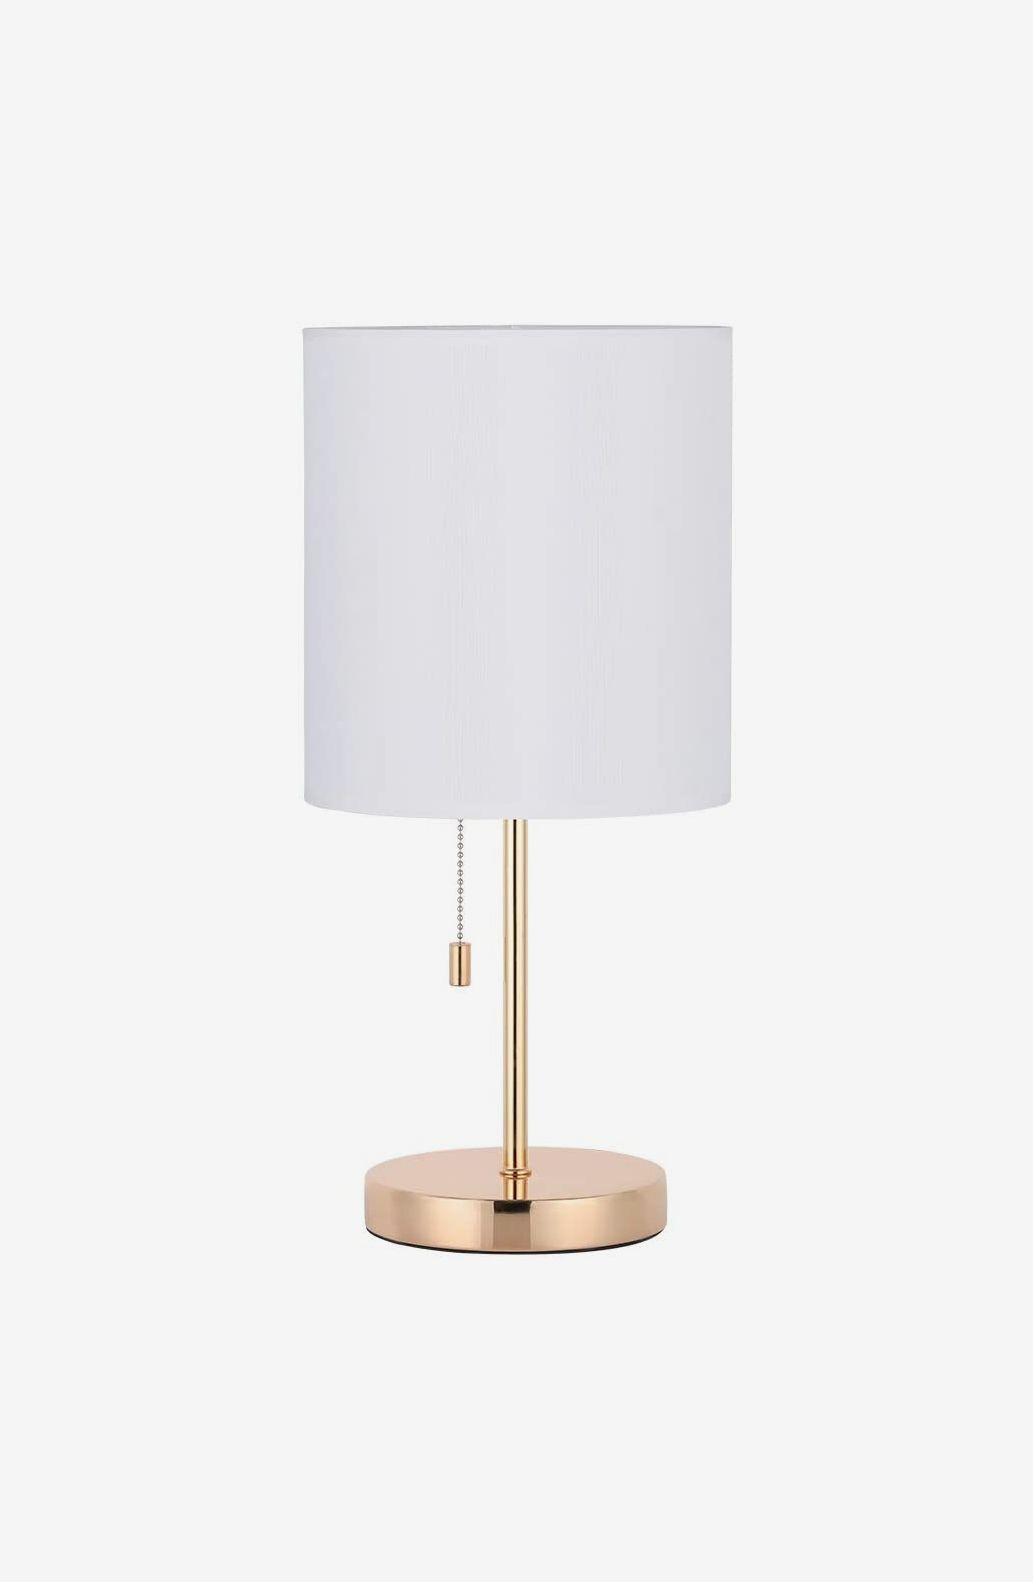 22 Best Bedside Lamps 2021 The Strategist, Best Bedside Table Lamps For Reading